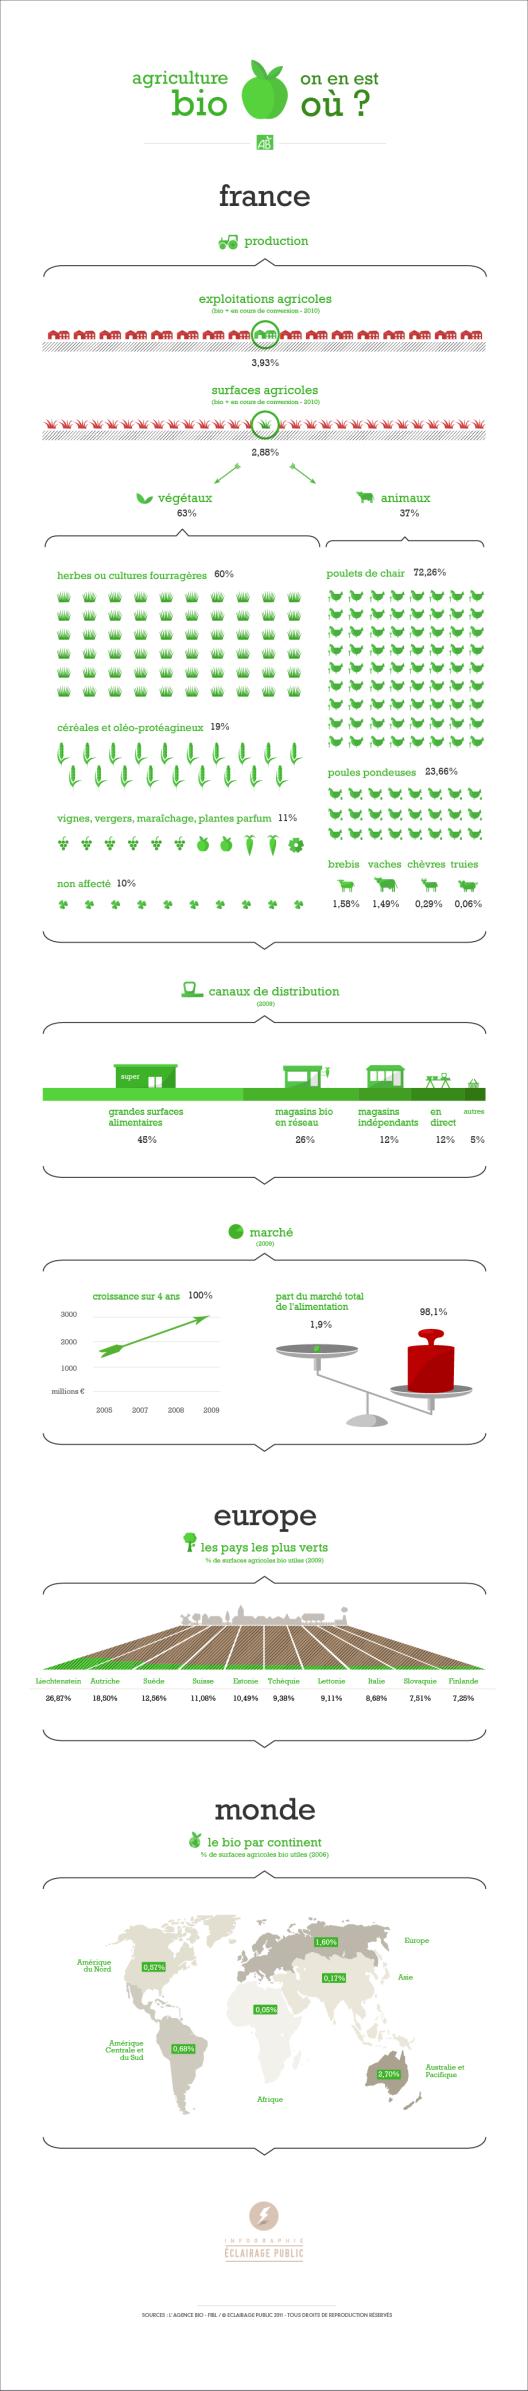 infographie-agriculture-bio-Eclairage-Public